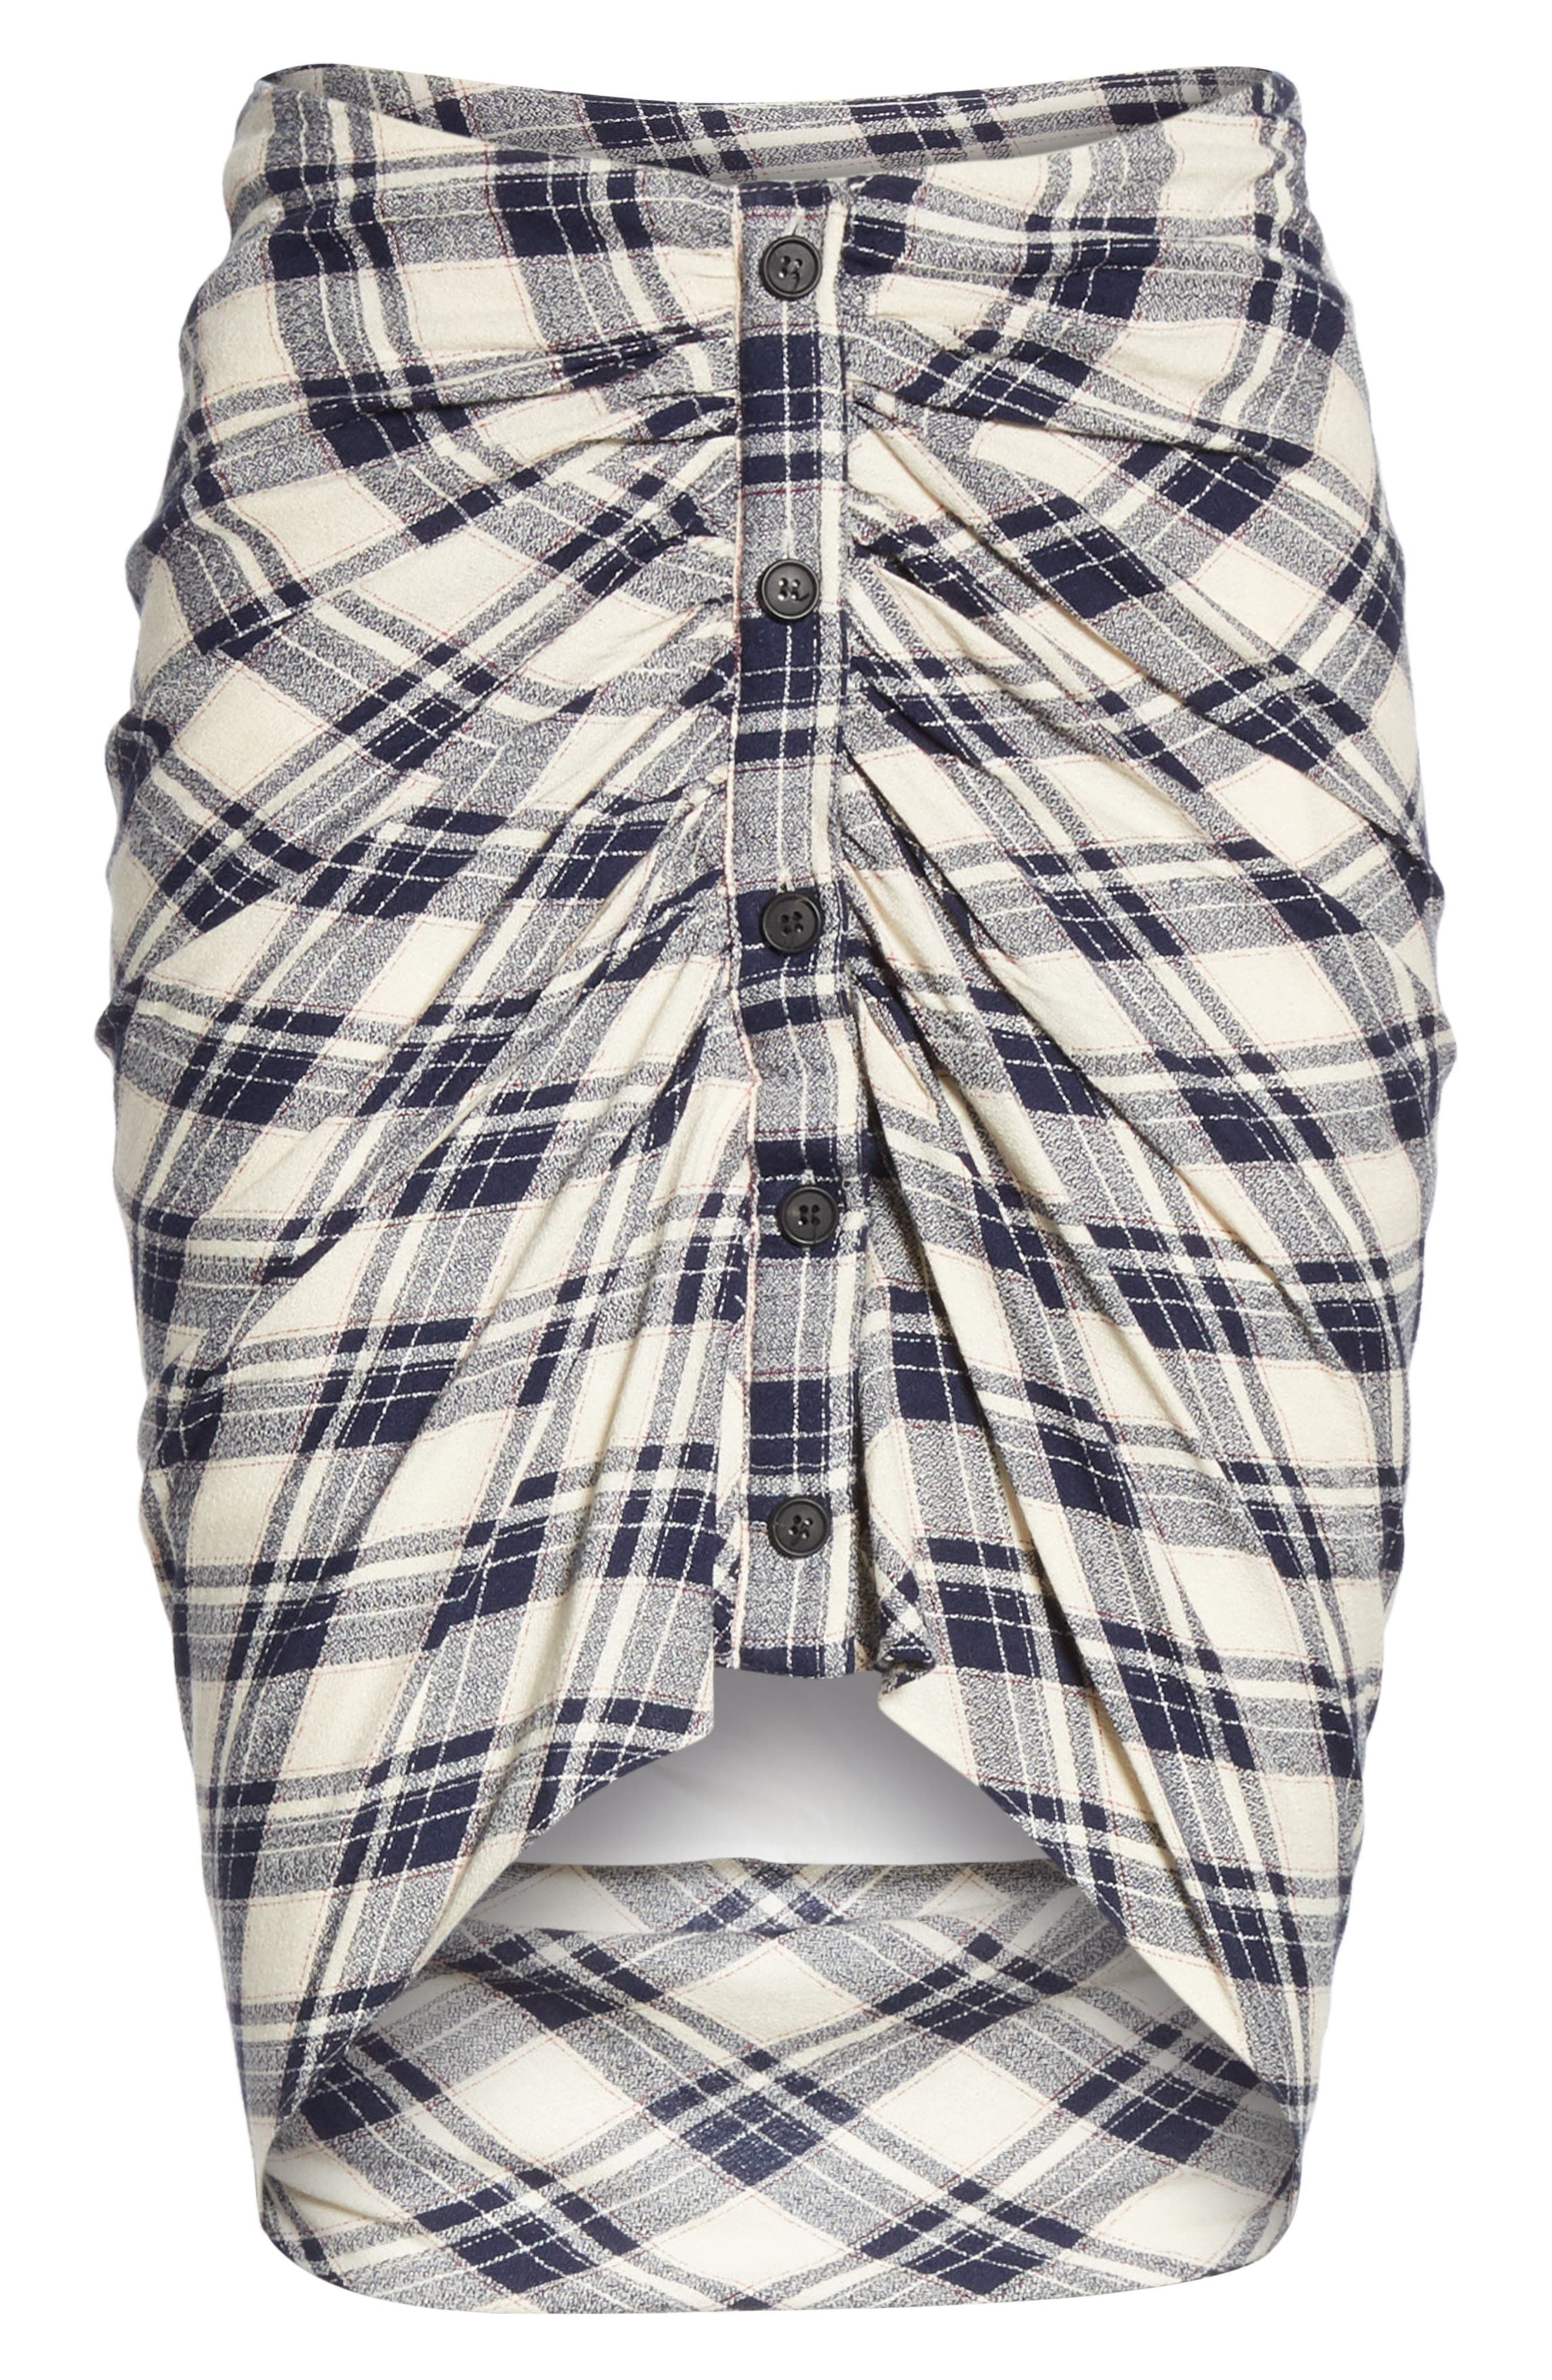 Murphy Ruched Miniskirt,                             Alternate thumbnail 6, color,                             NAVY/ ECRU